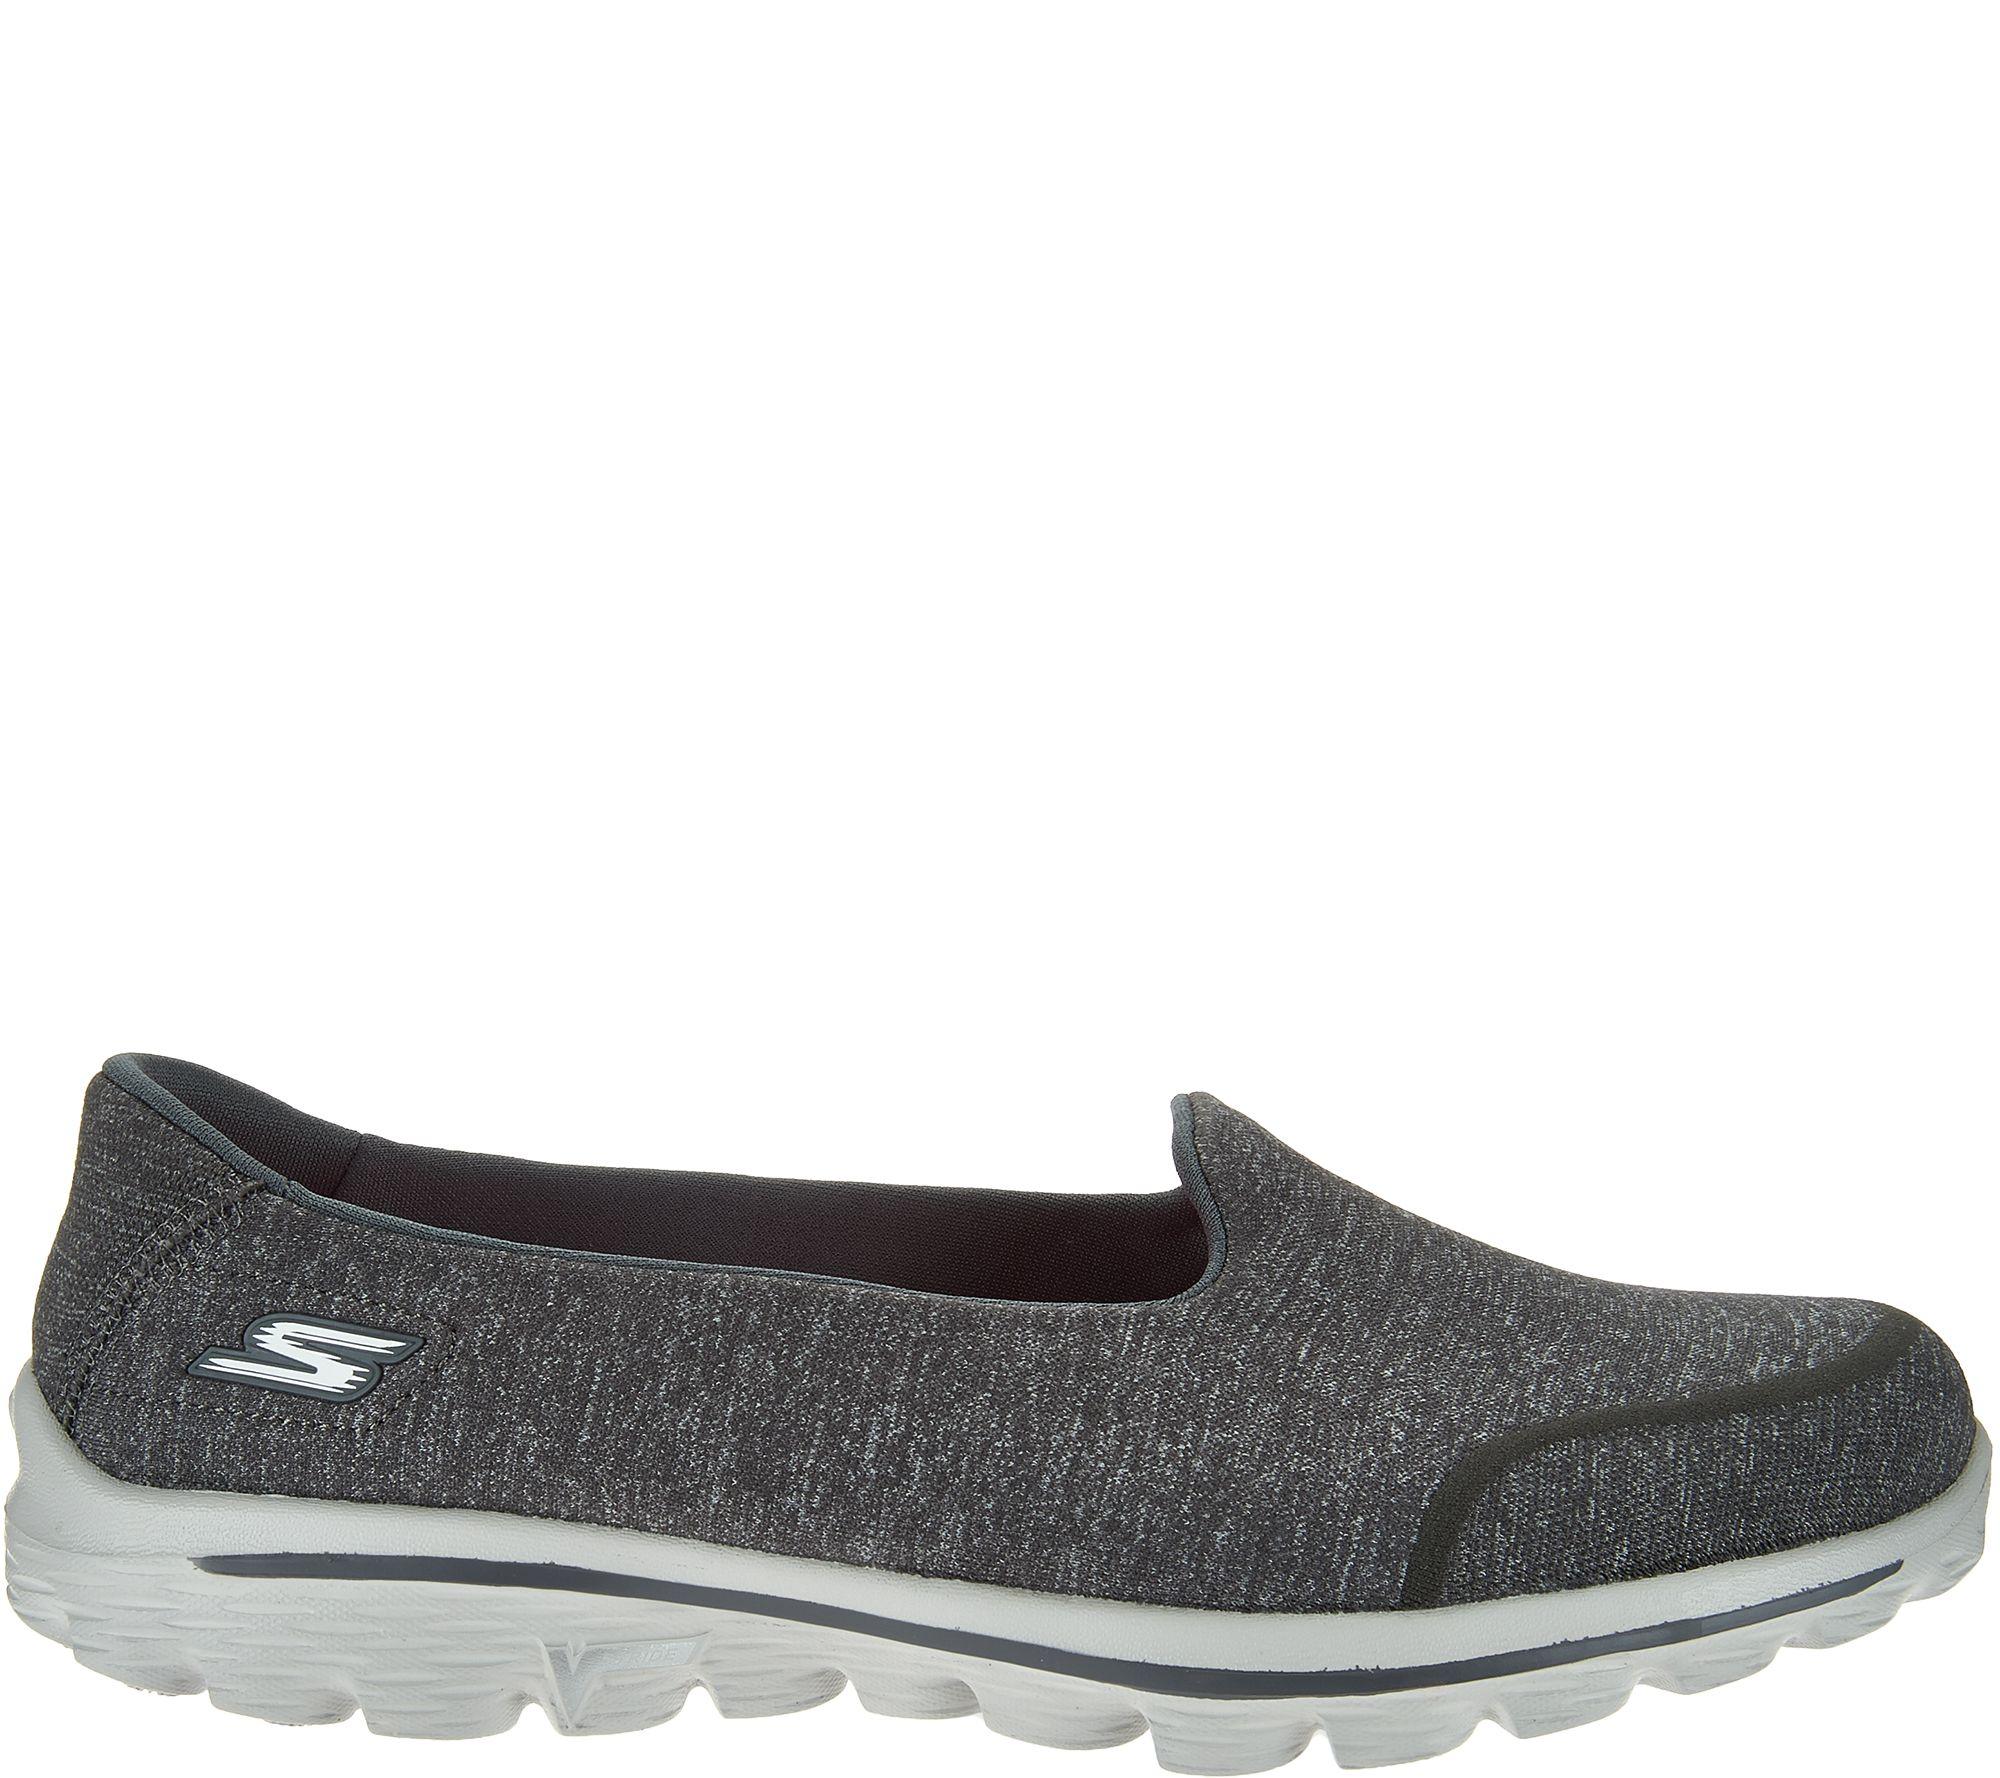 Skechers GOwalk 2 Super Sock Walking Sneaker - Courage - Page 1 — QVC.com